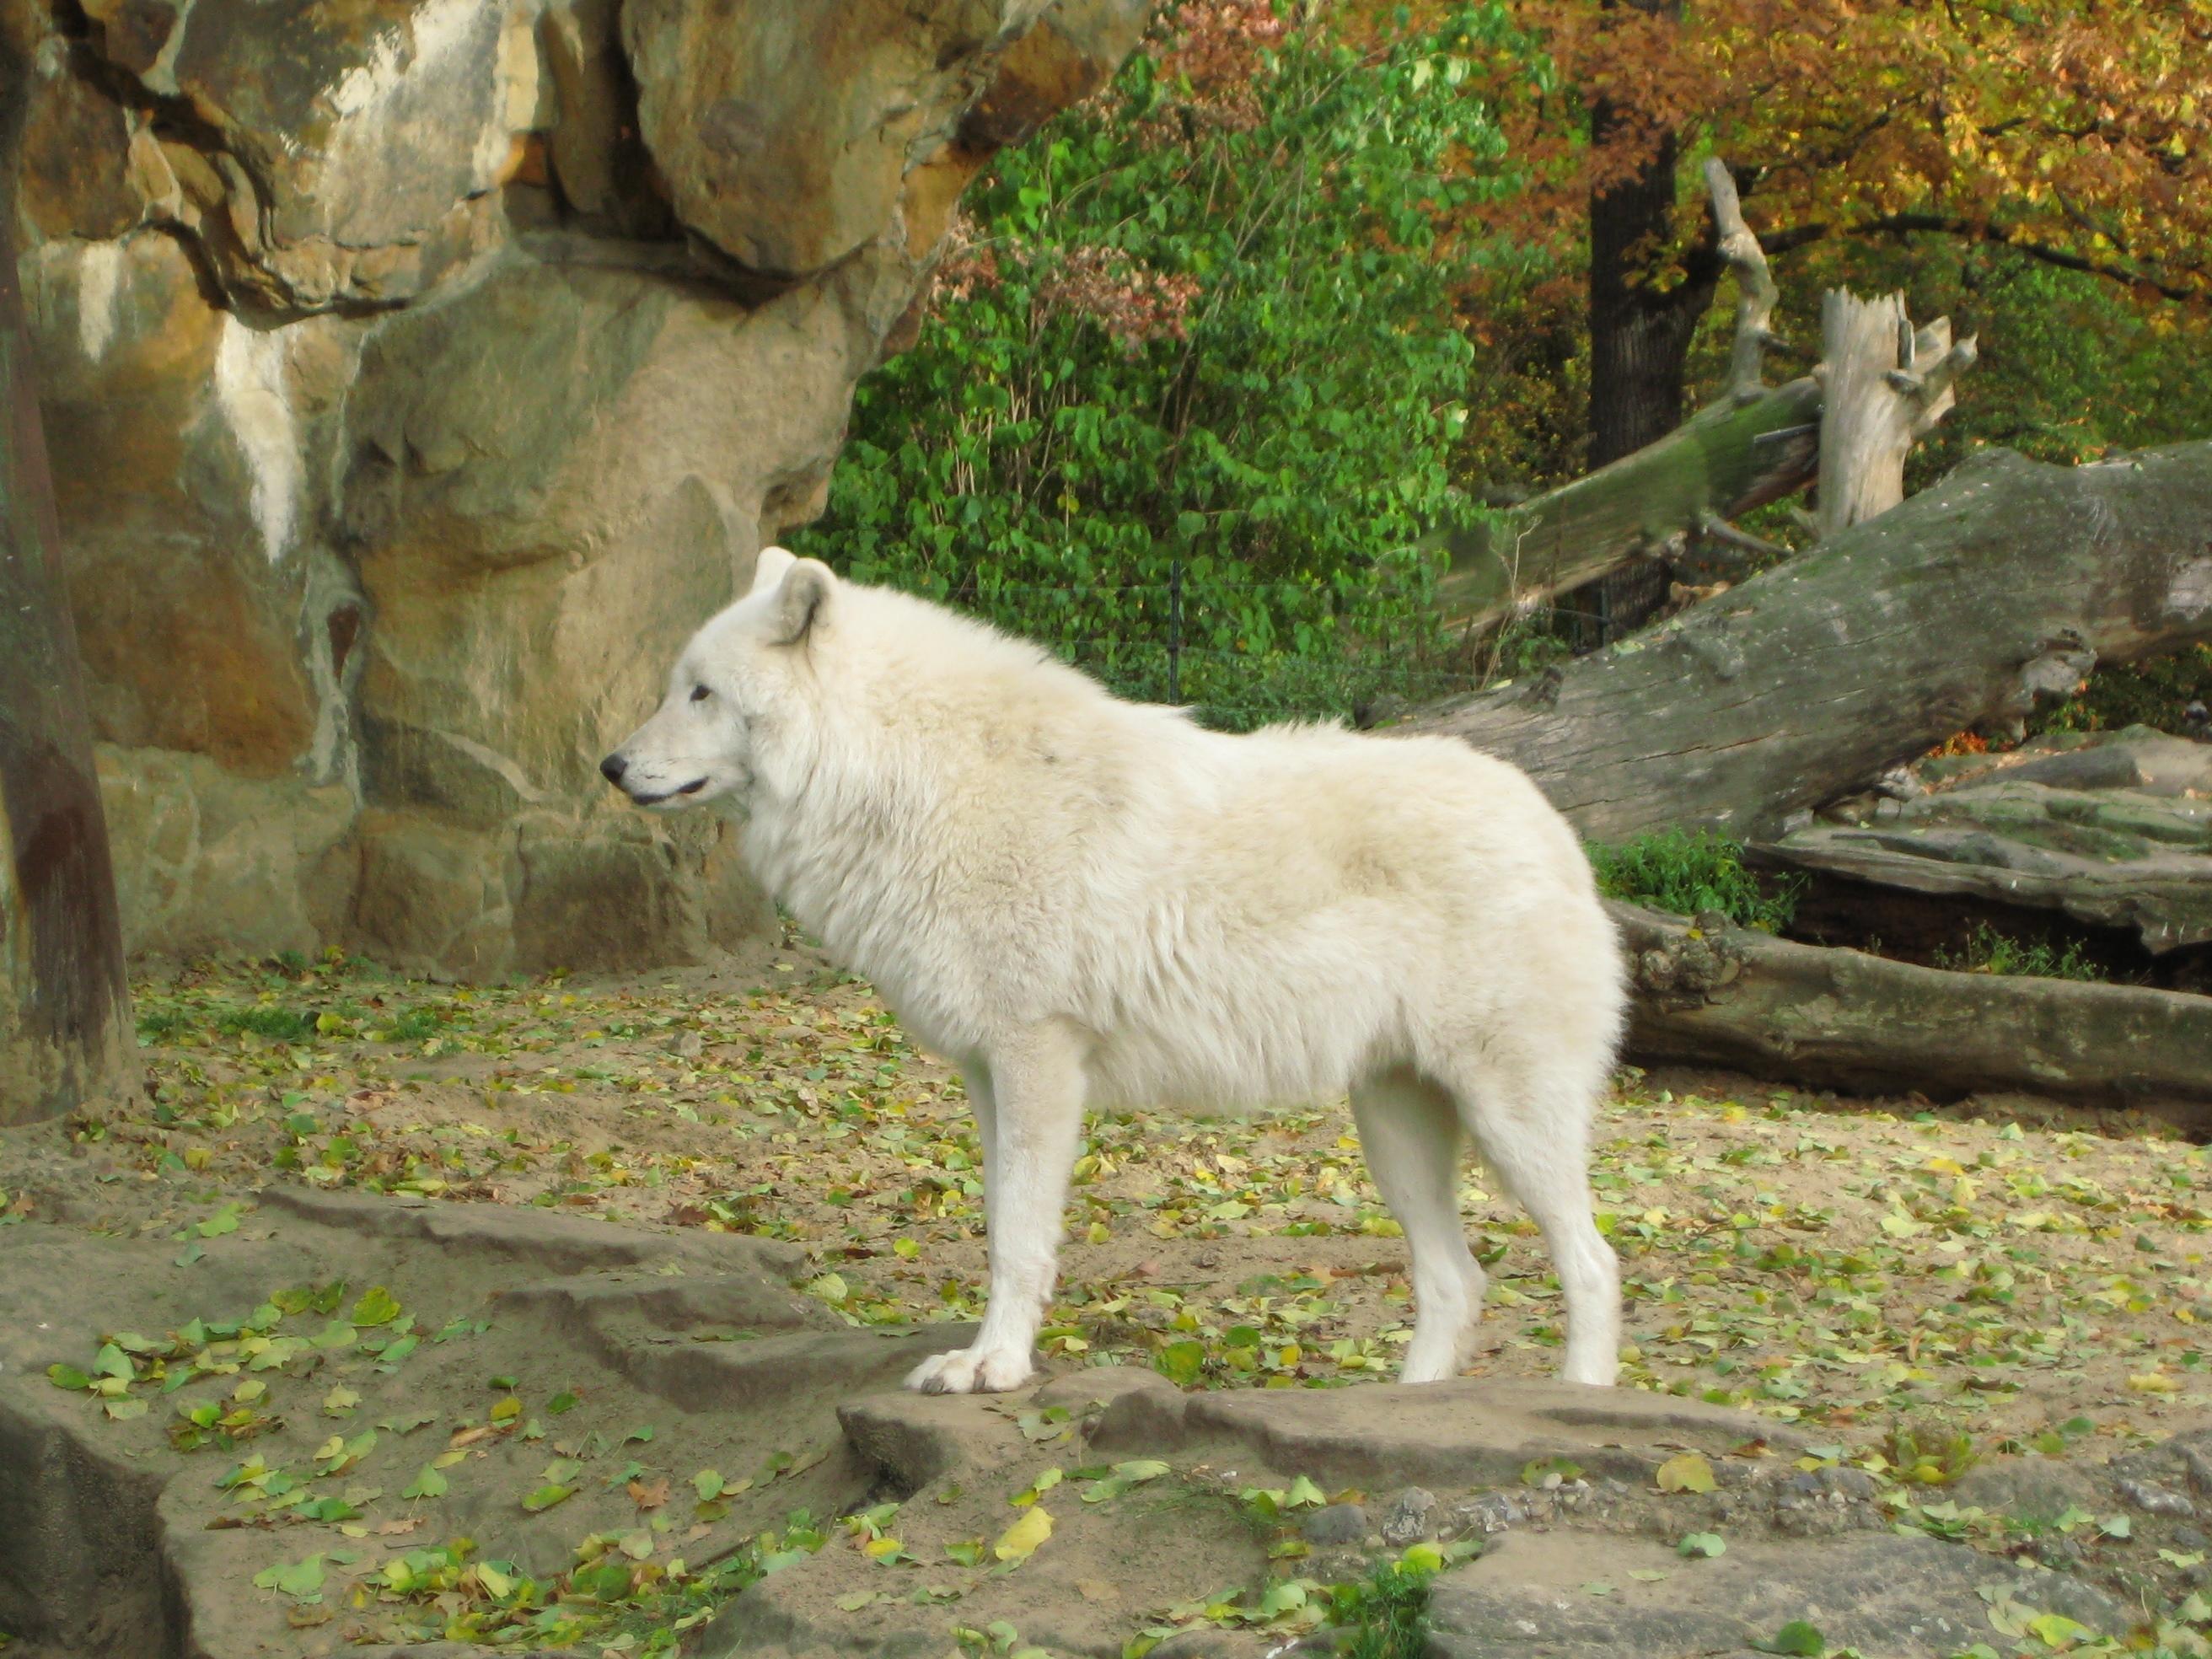 http://upload.wikimedia.org/wikipedia/commons/0/06/Wolf_Zoo_Berlin.jpg